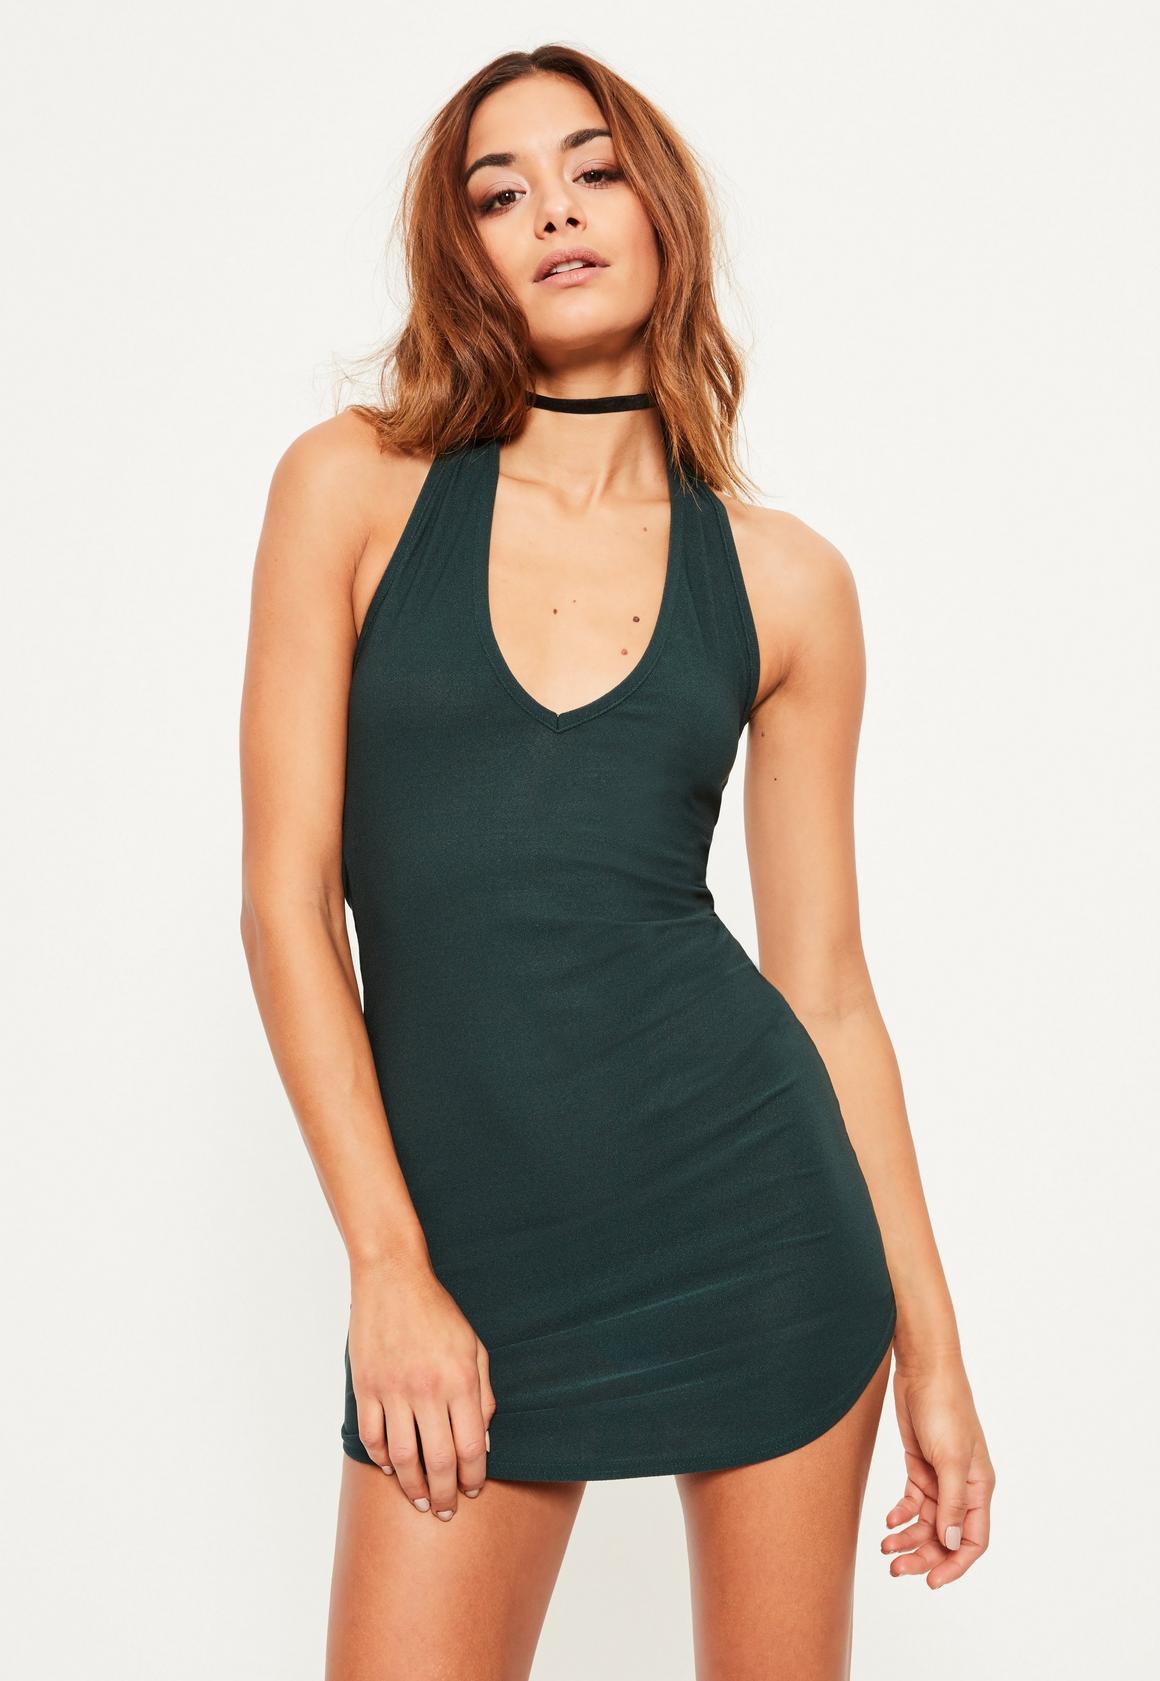 Backless Dresses, Low Back Dress - Missguided Australia